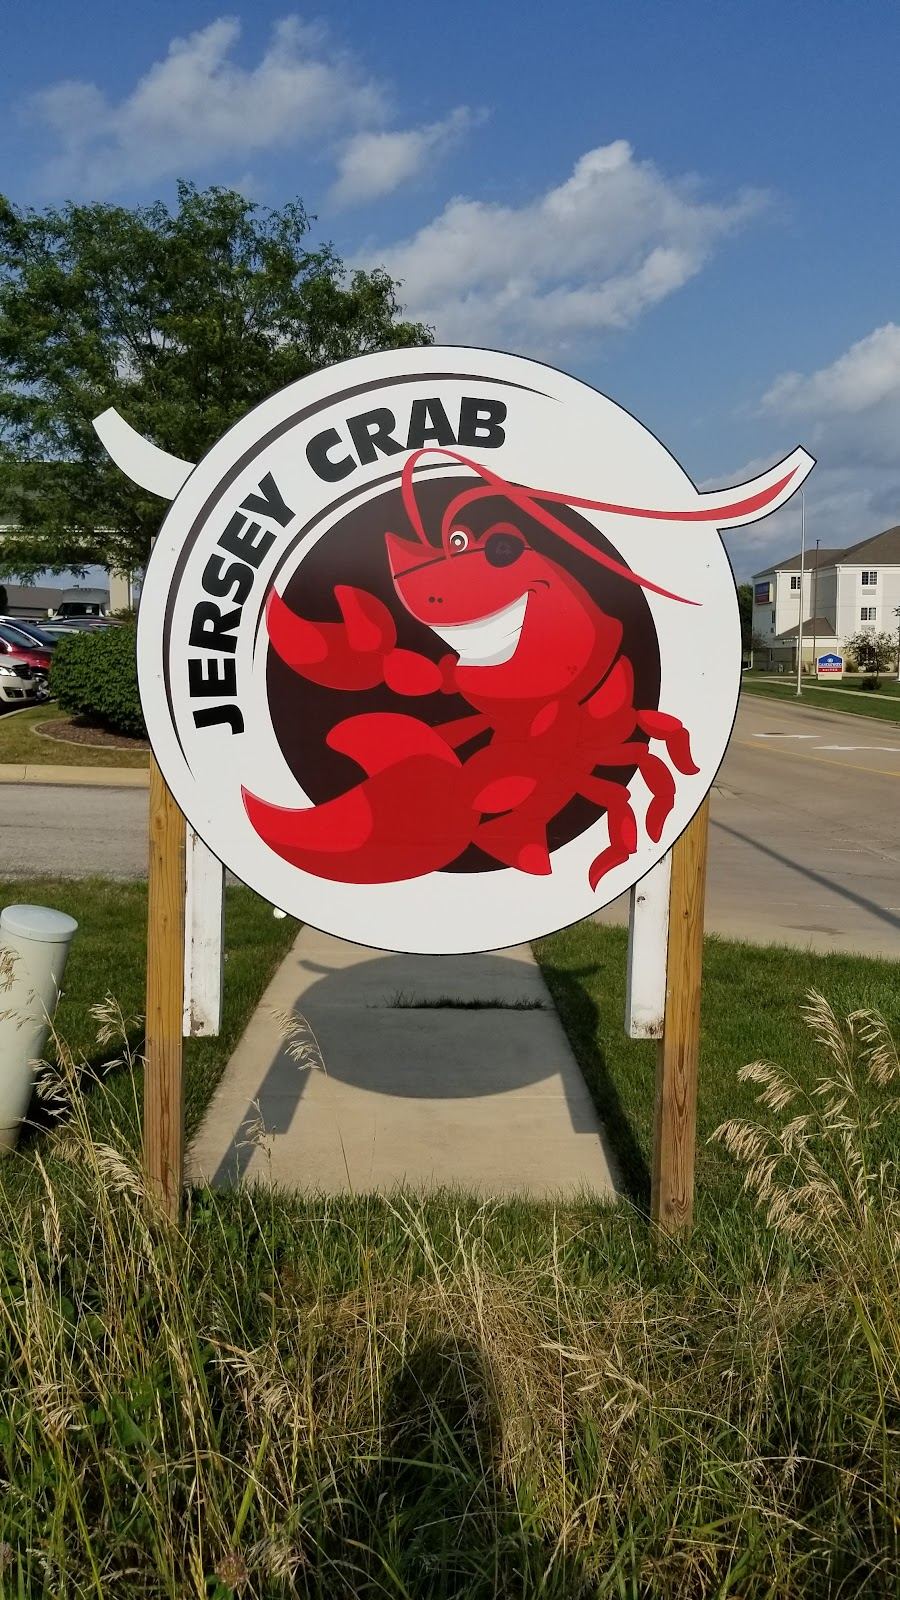 Jersey Crab | restaurant | 5300 W War Memorial Dr, Peoria, IL 61615, USA